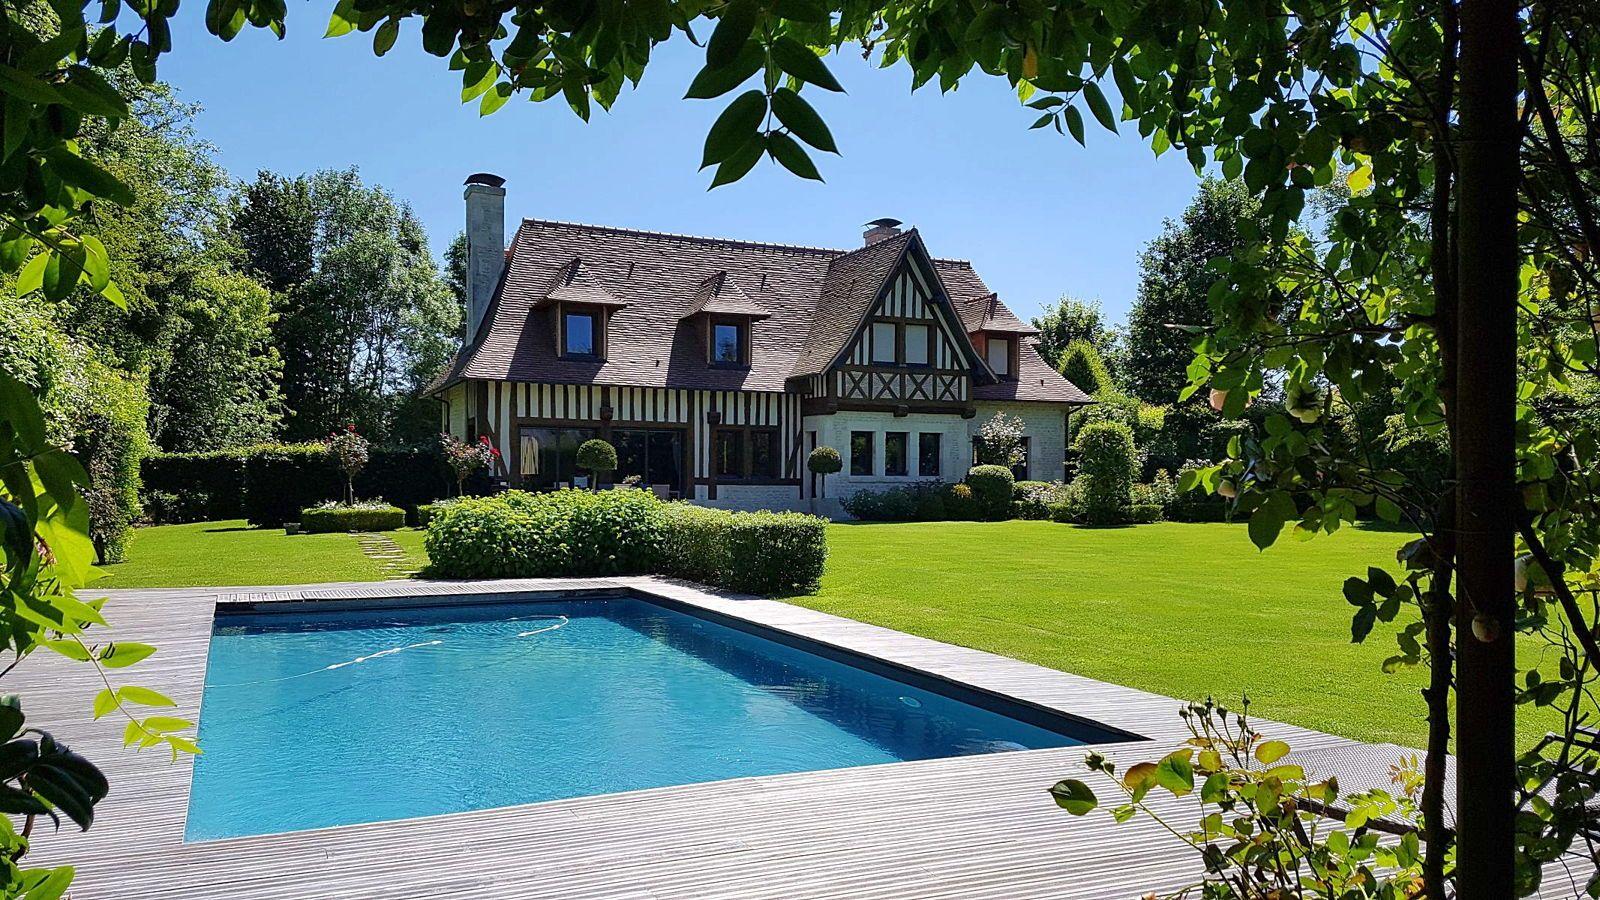 Vends splendide demeure normande, 340m², 4ch, 20mn de Deauville